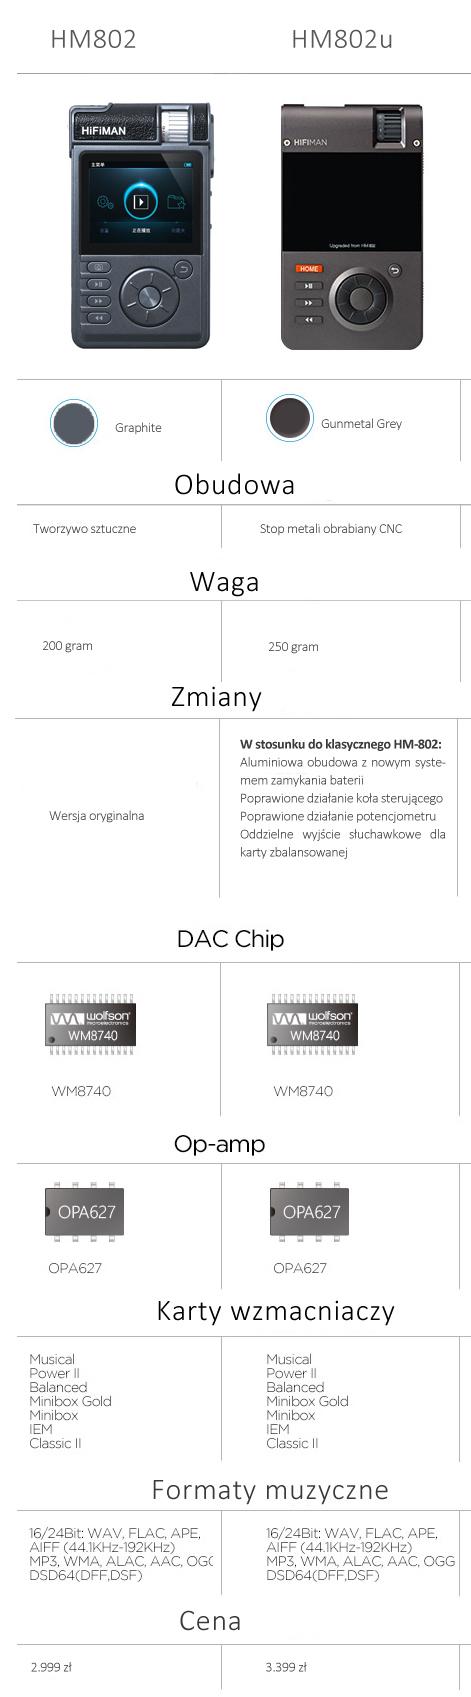 HiFiMAN HM-802U (HM802U) Upgraded High-Res Portable Music Player  FLAC/WAV/ALAC/AAC